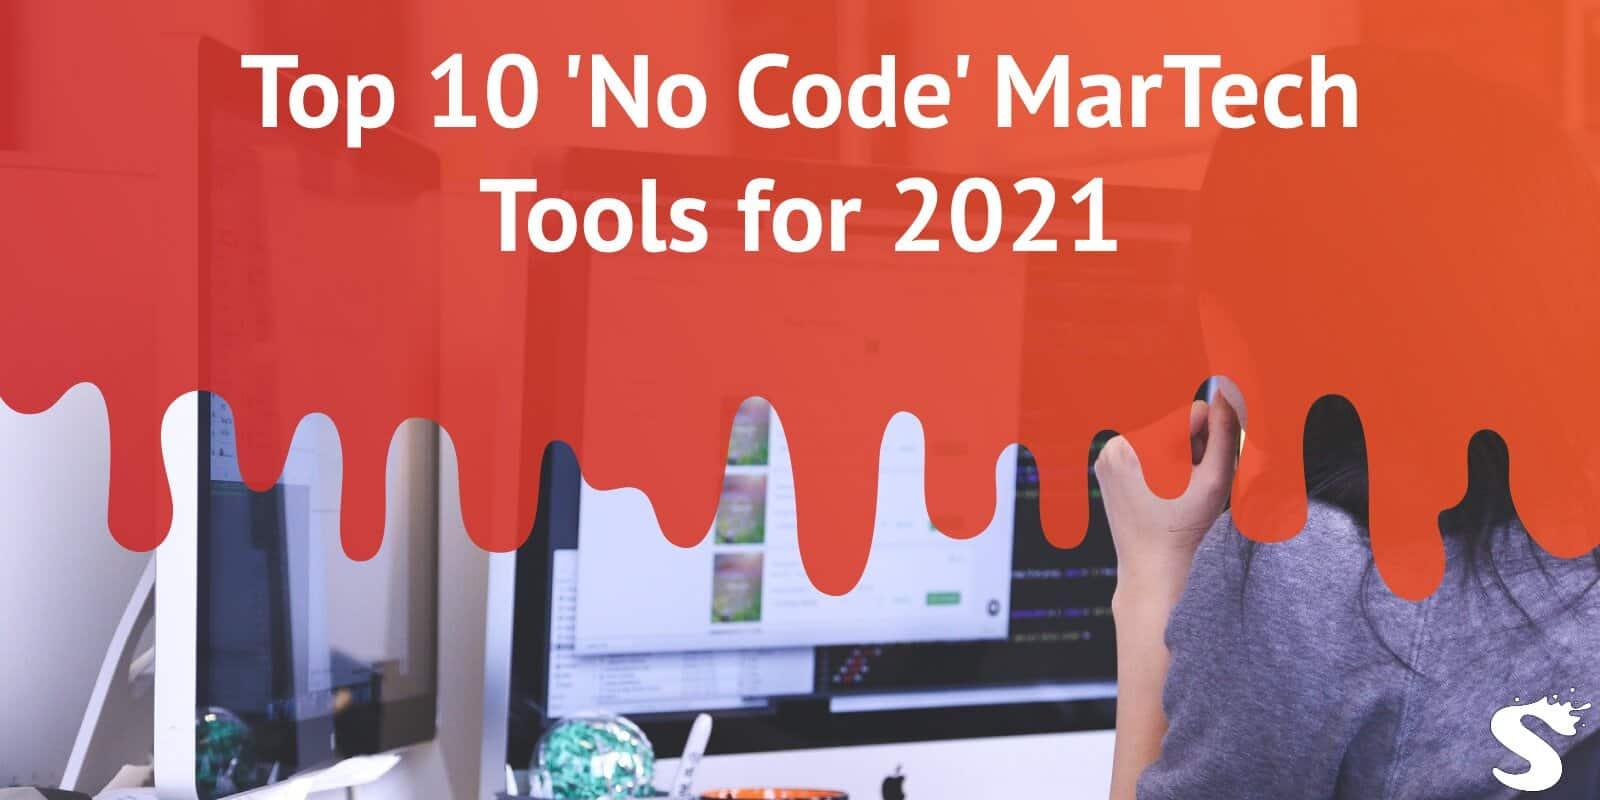 Top 10 'No Code' MarTech Tools for 2021